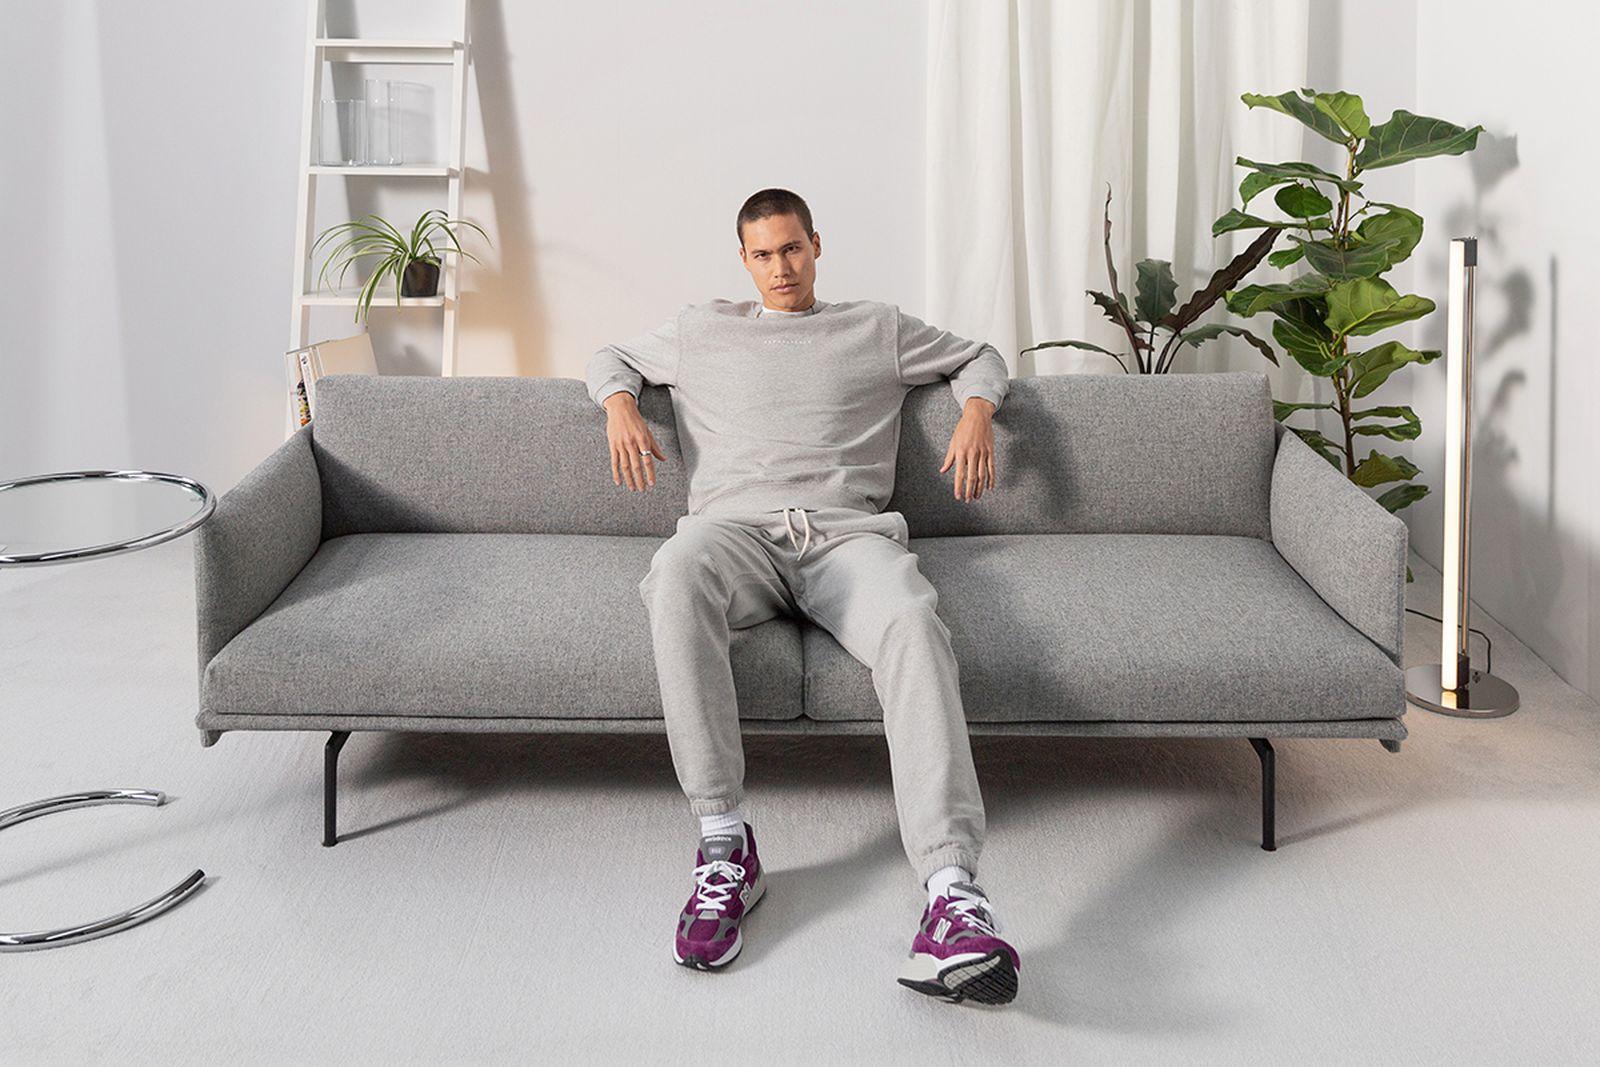 new-balance-992-purple-grey-release-date-price-01